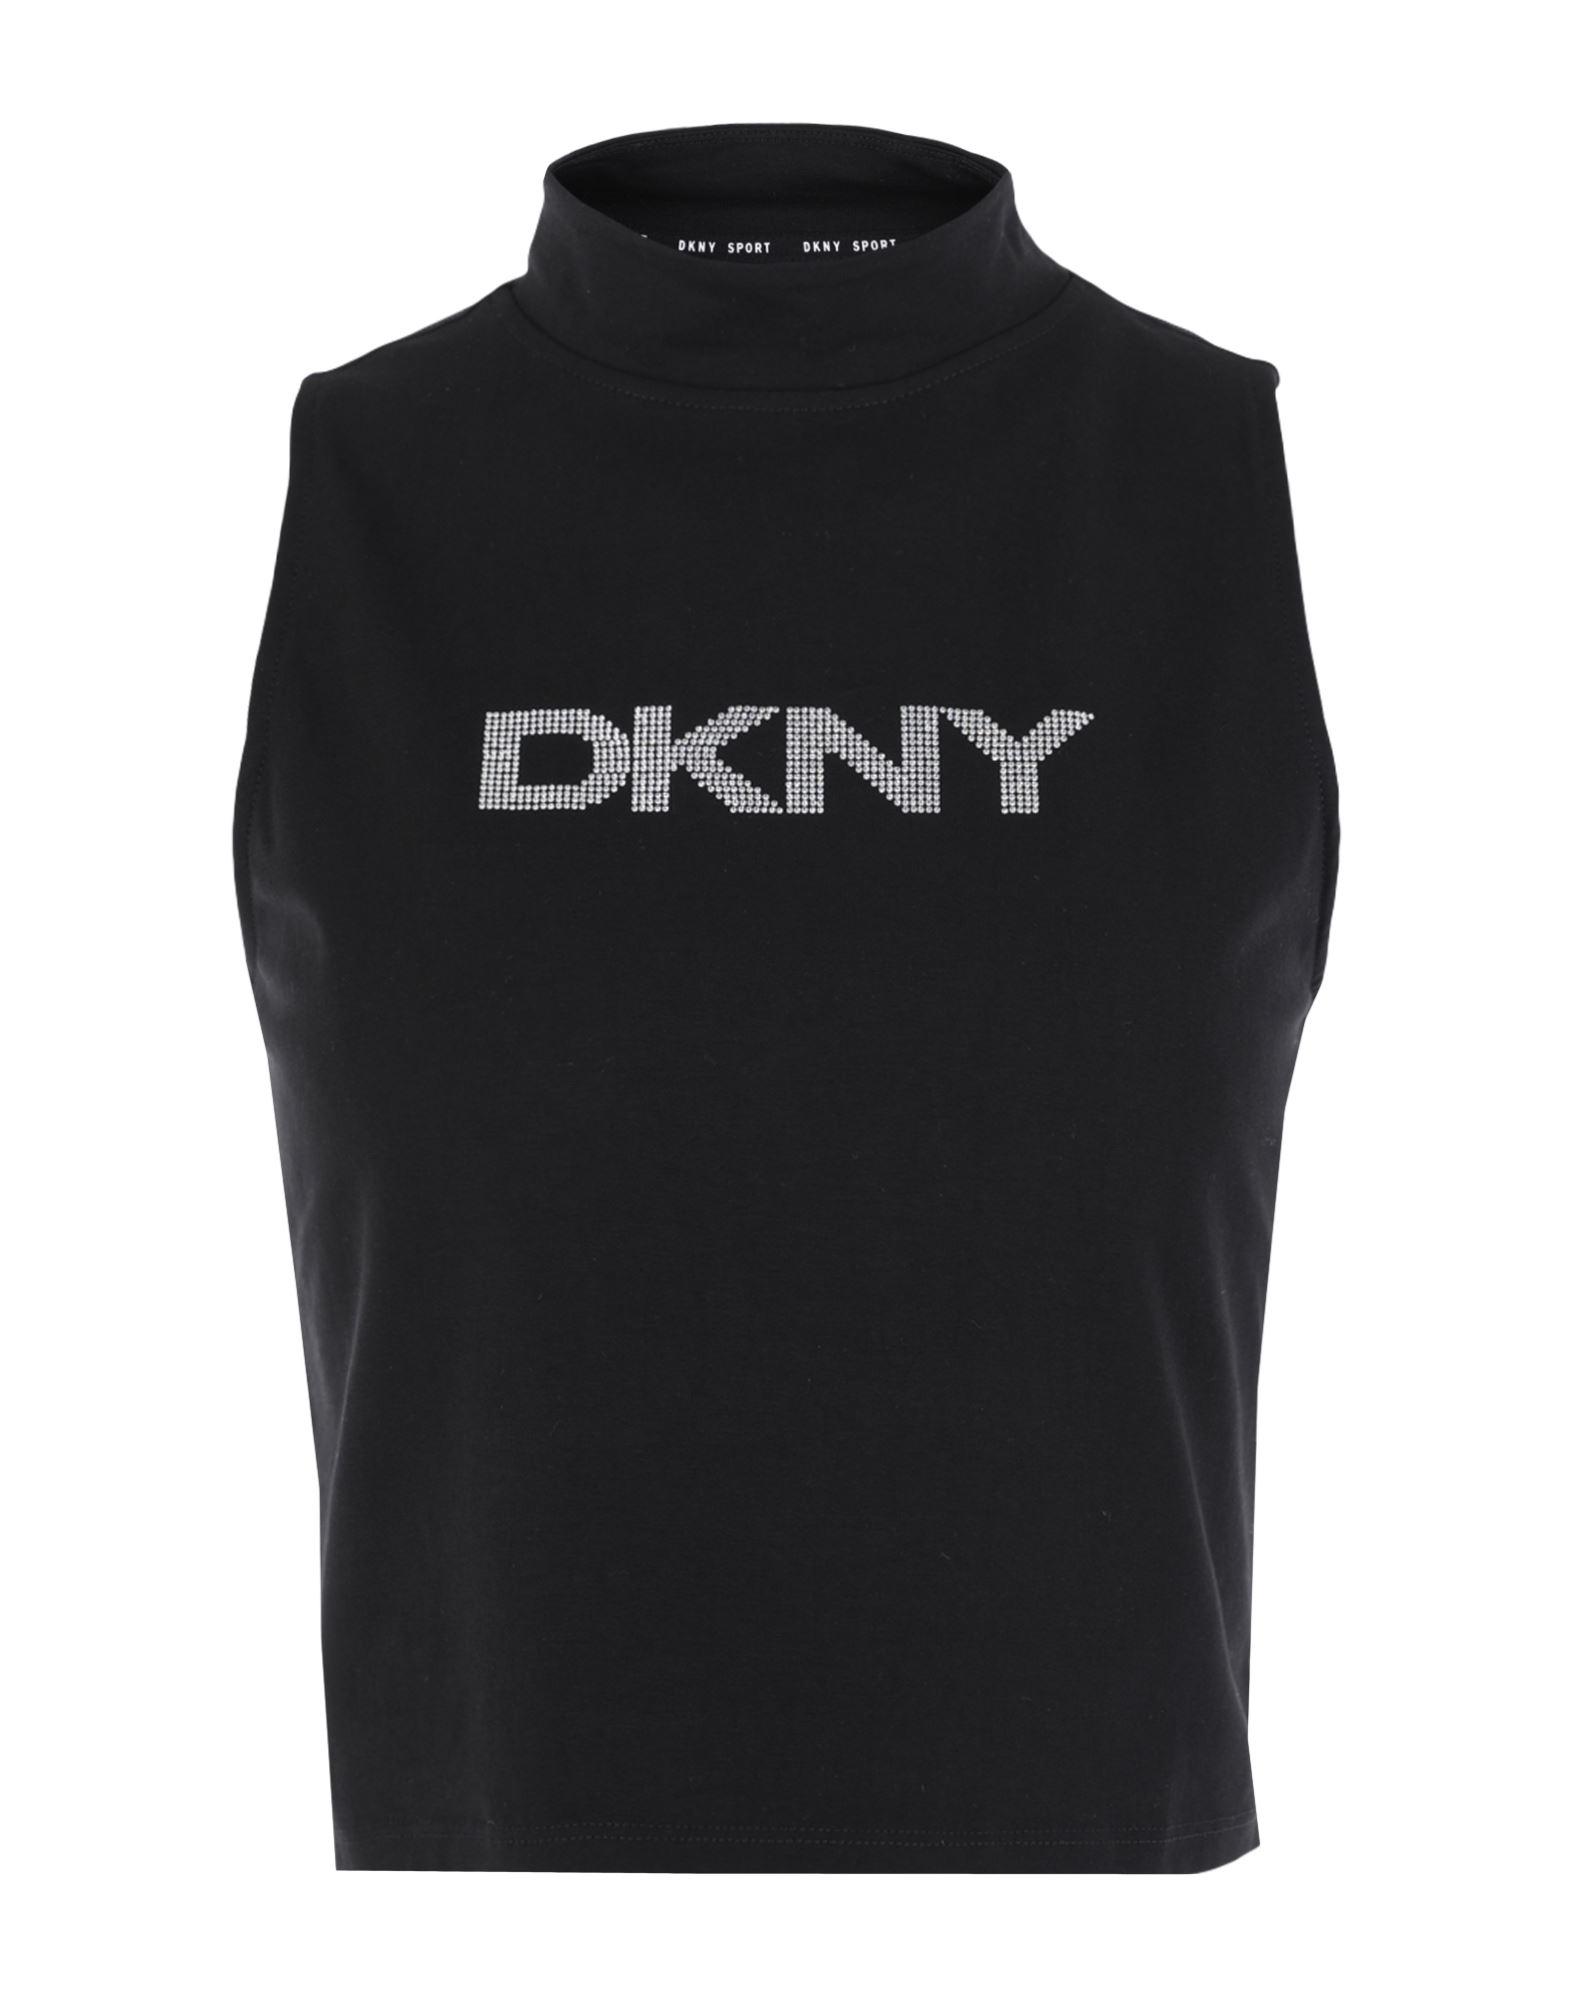 топ dkny топ DKNY Топ без рукавов